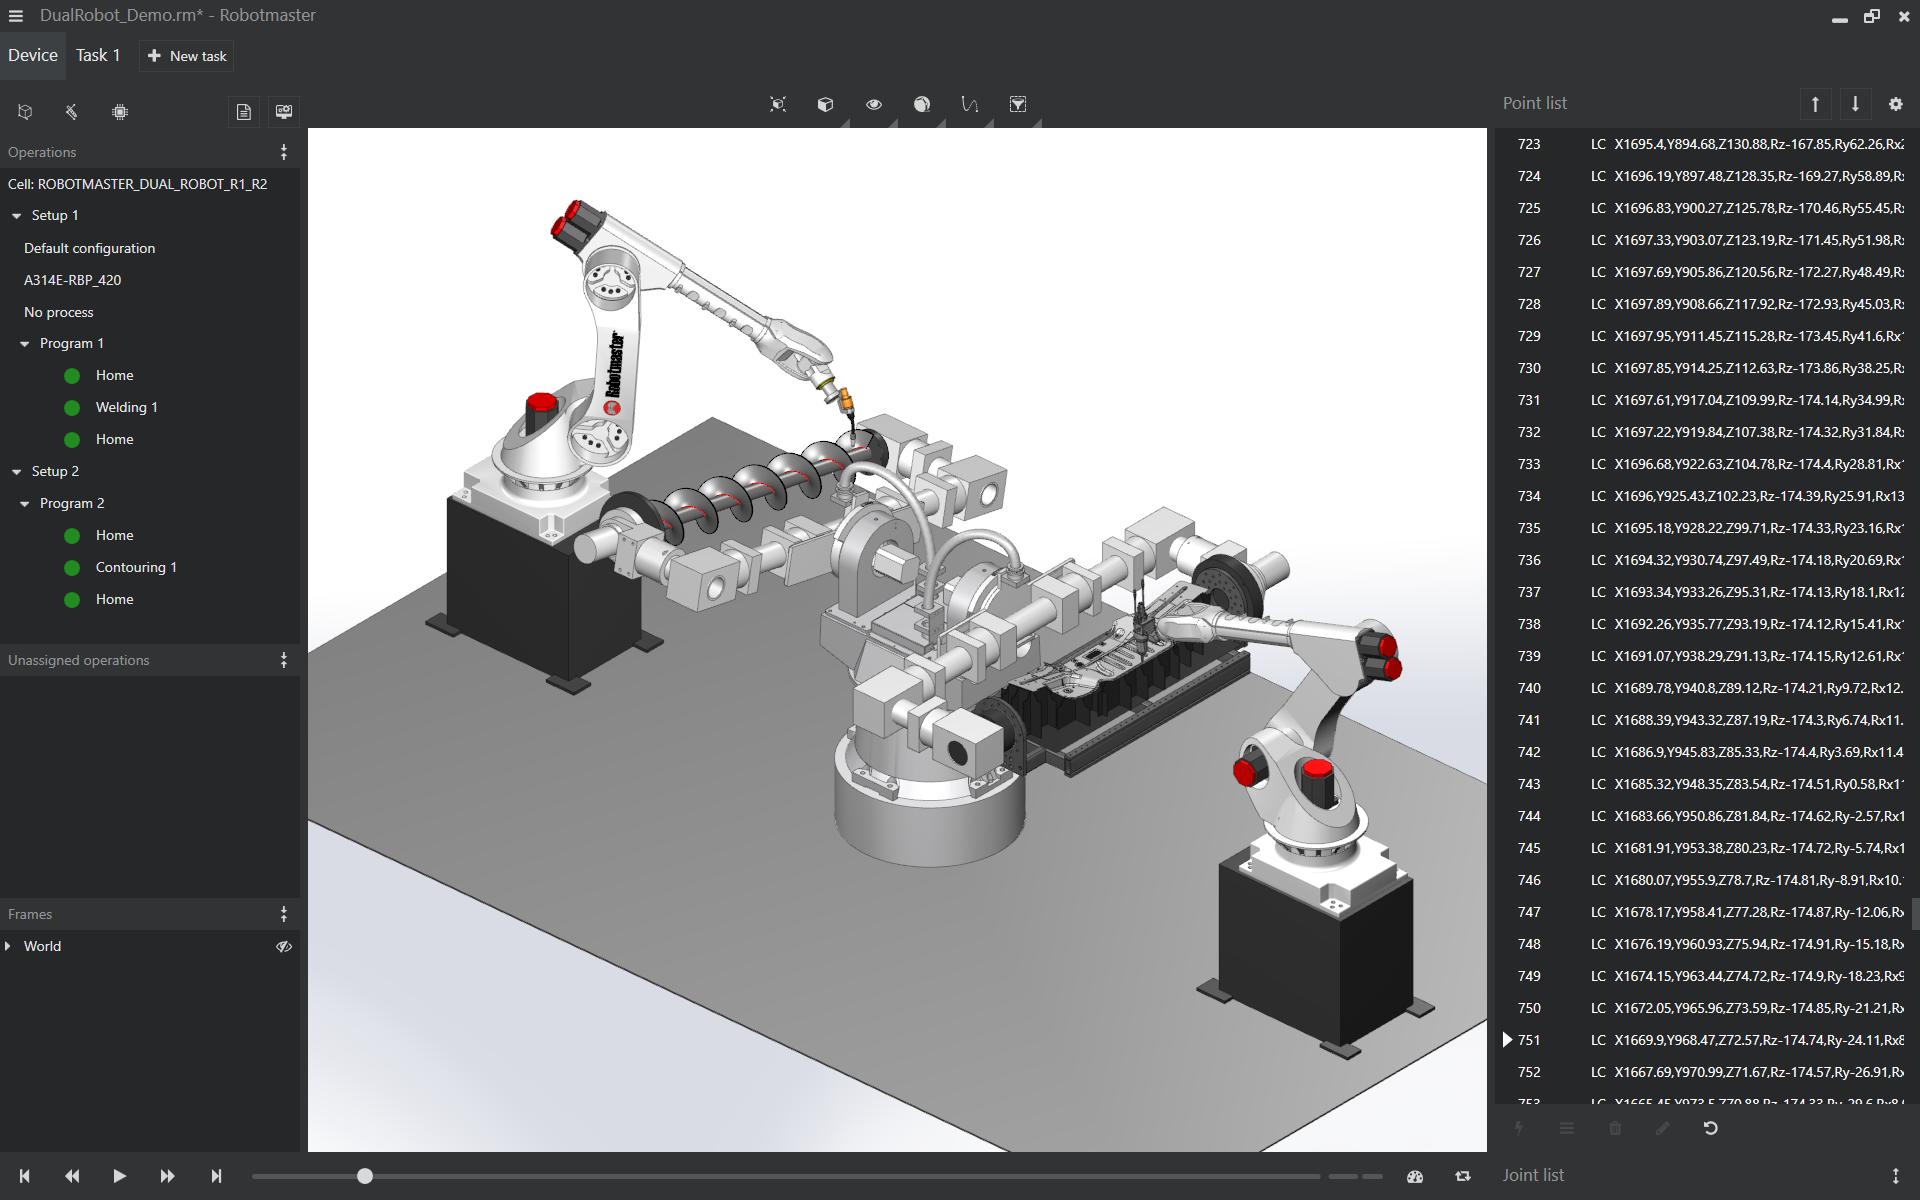 Robotmaster - Dual Robot Cell